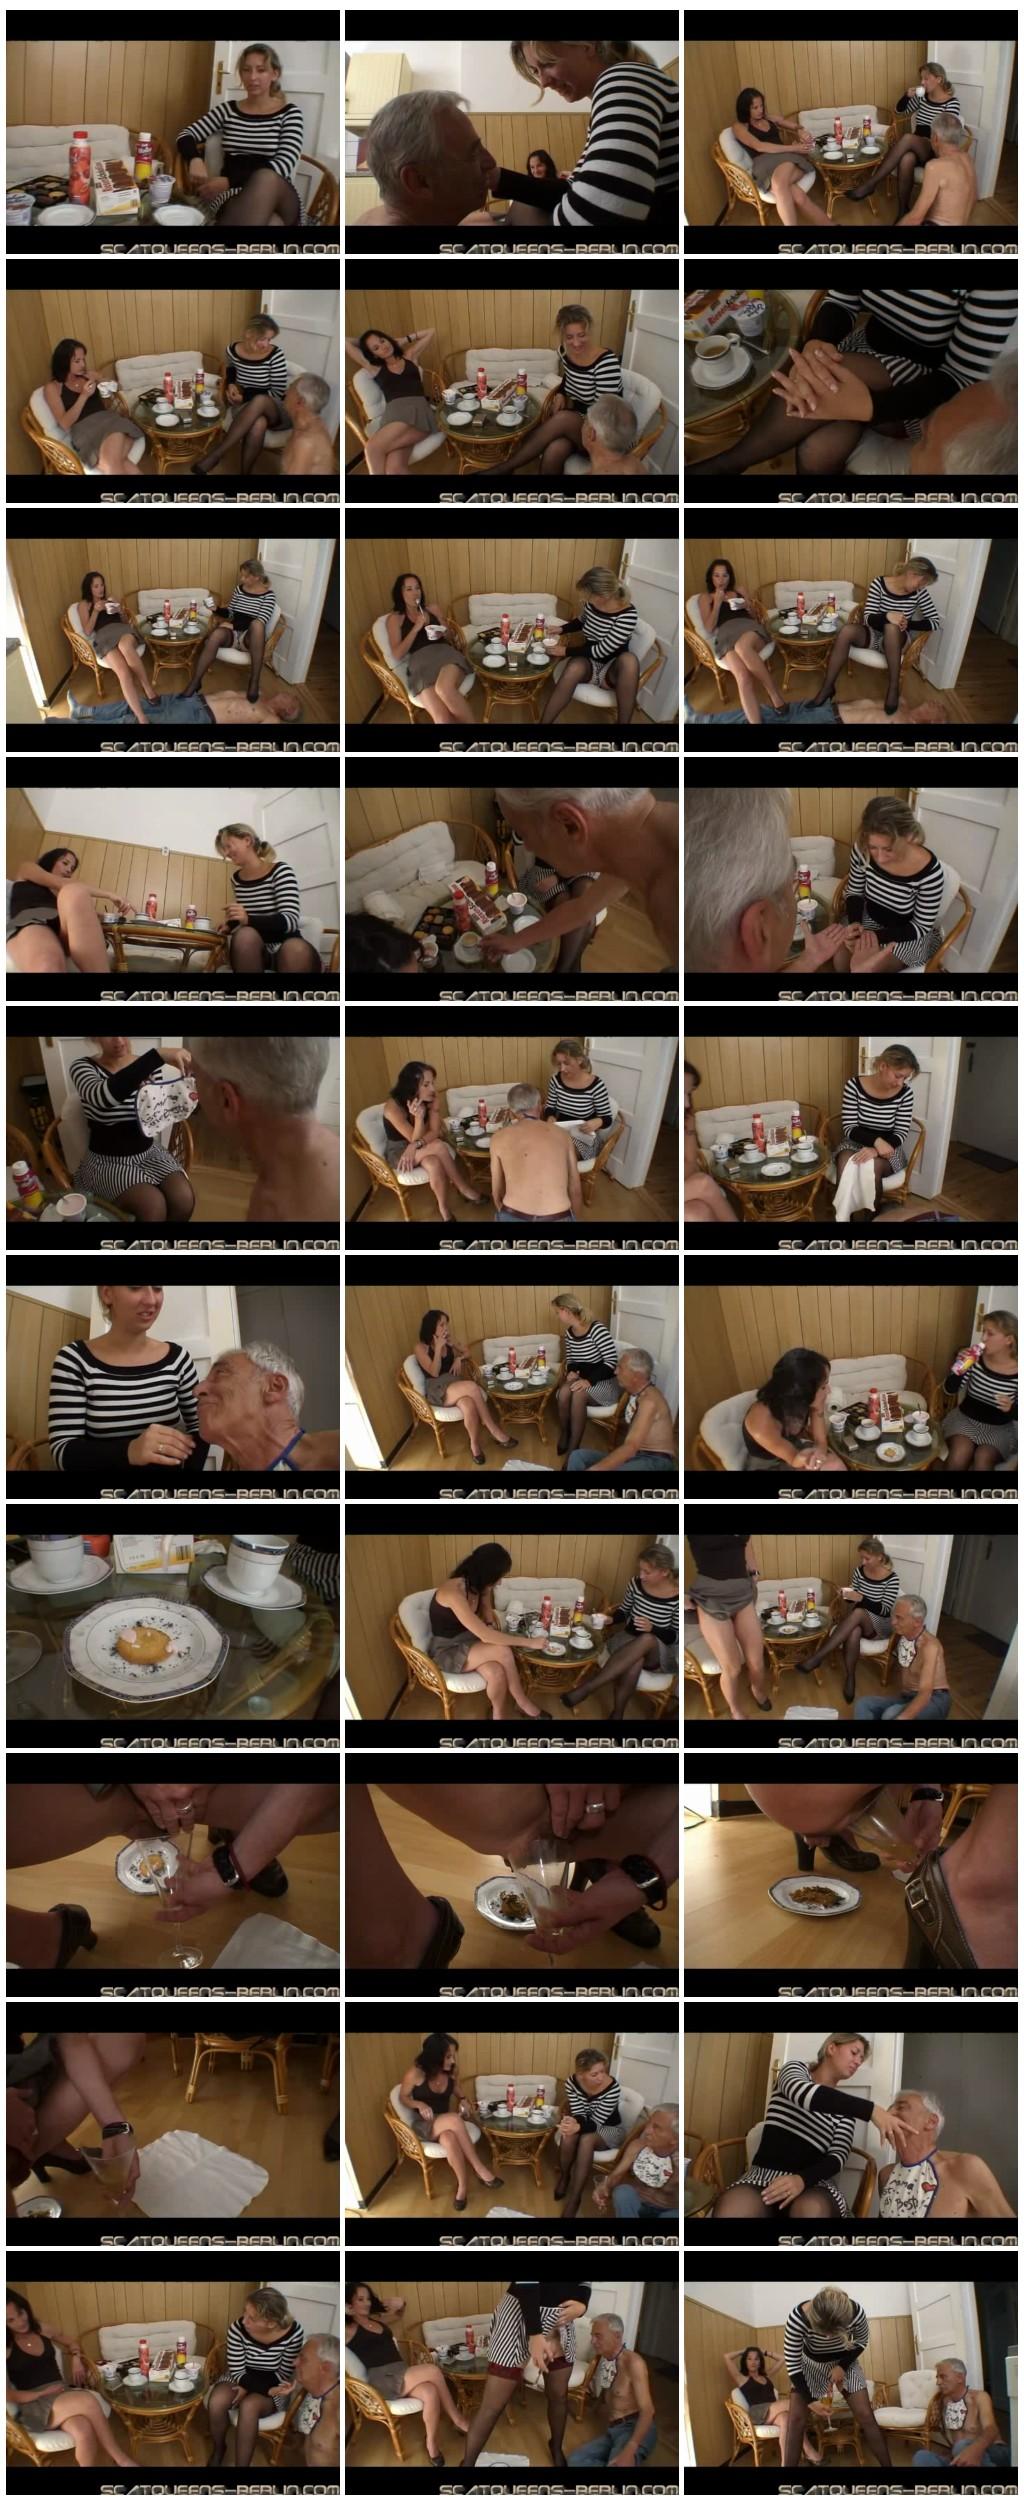 Dessert part1Scat pissing shit defecation Femdom Toilet SlaveryFace shitFingeringDomination Eat shit HumiliationsLicking Drink peespitting thumb - Dessert part1[Scat, pissing, shit, defecation, Femdom ,Toilet Slavery,Domination, Eat shit , Humiliations,Licking, Drink pee]